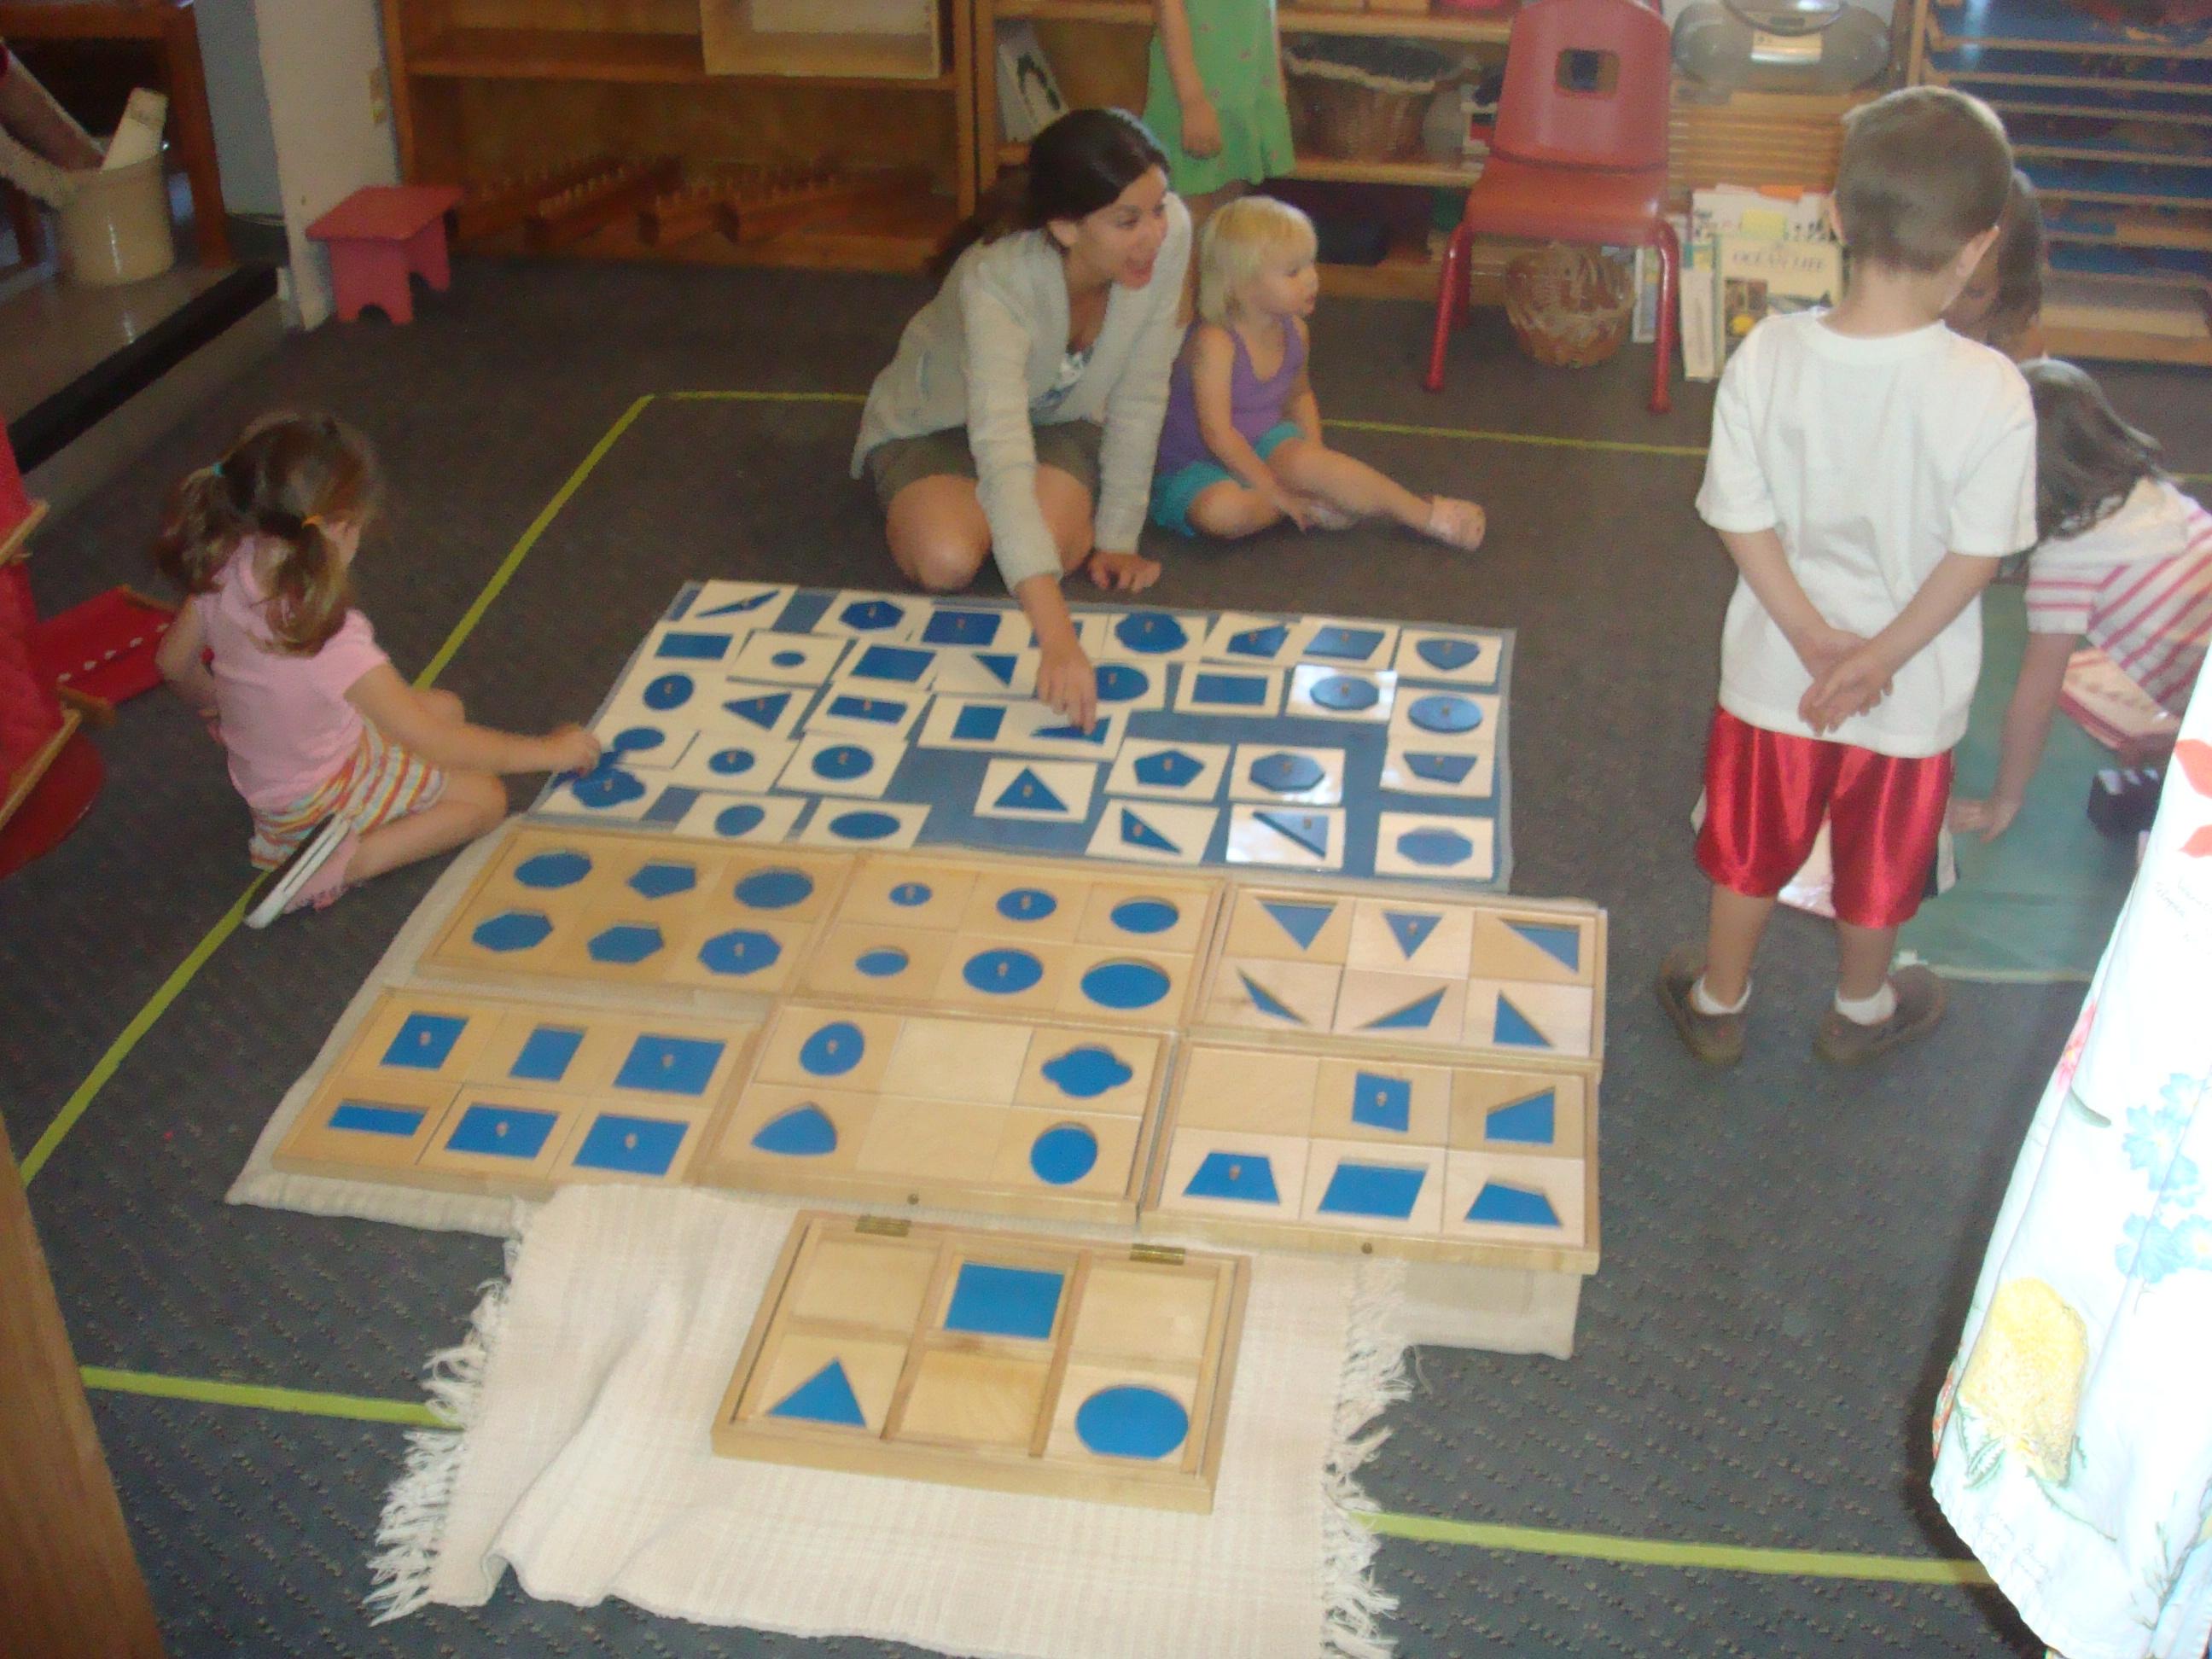 Community Montessori School image 2